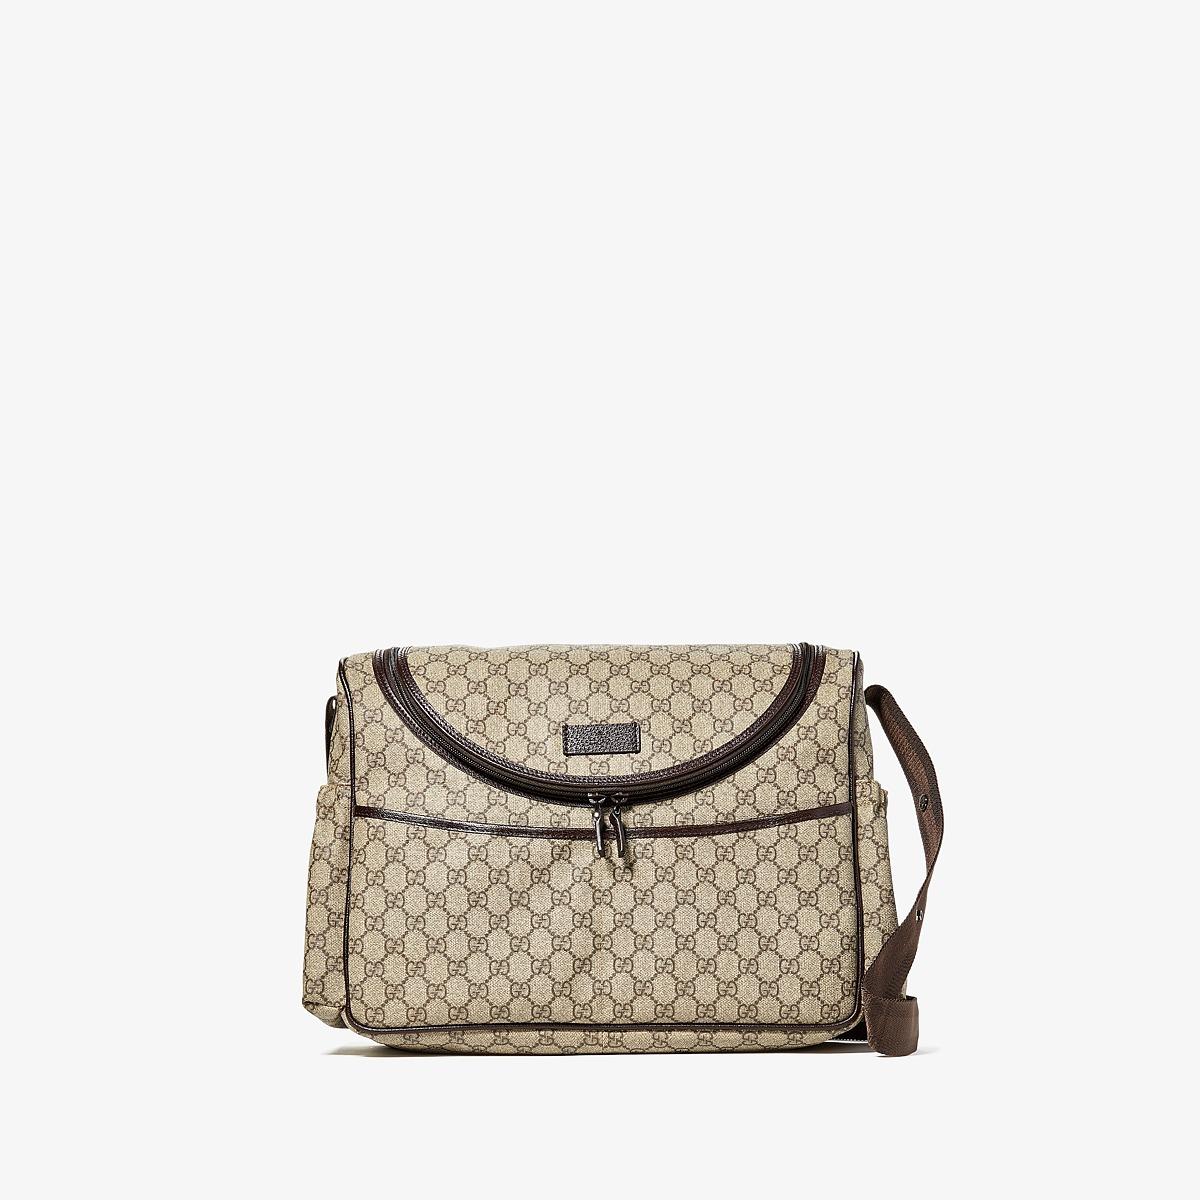 Gucci Kids - Handbag 123326K8K9R (Chocolate/Beige) Handbags